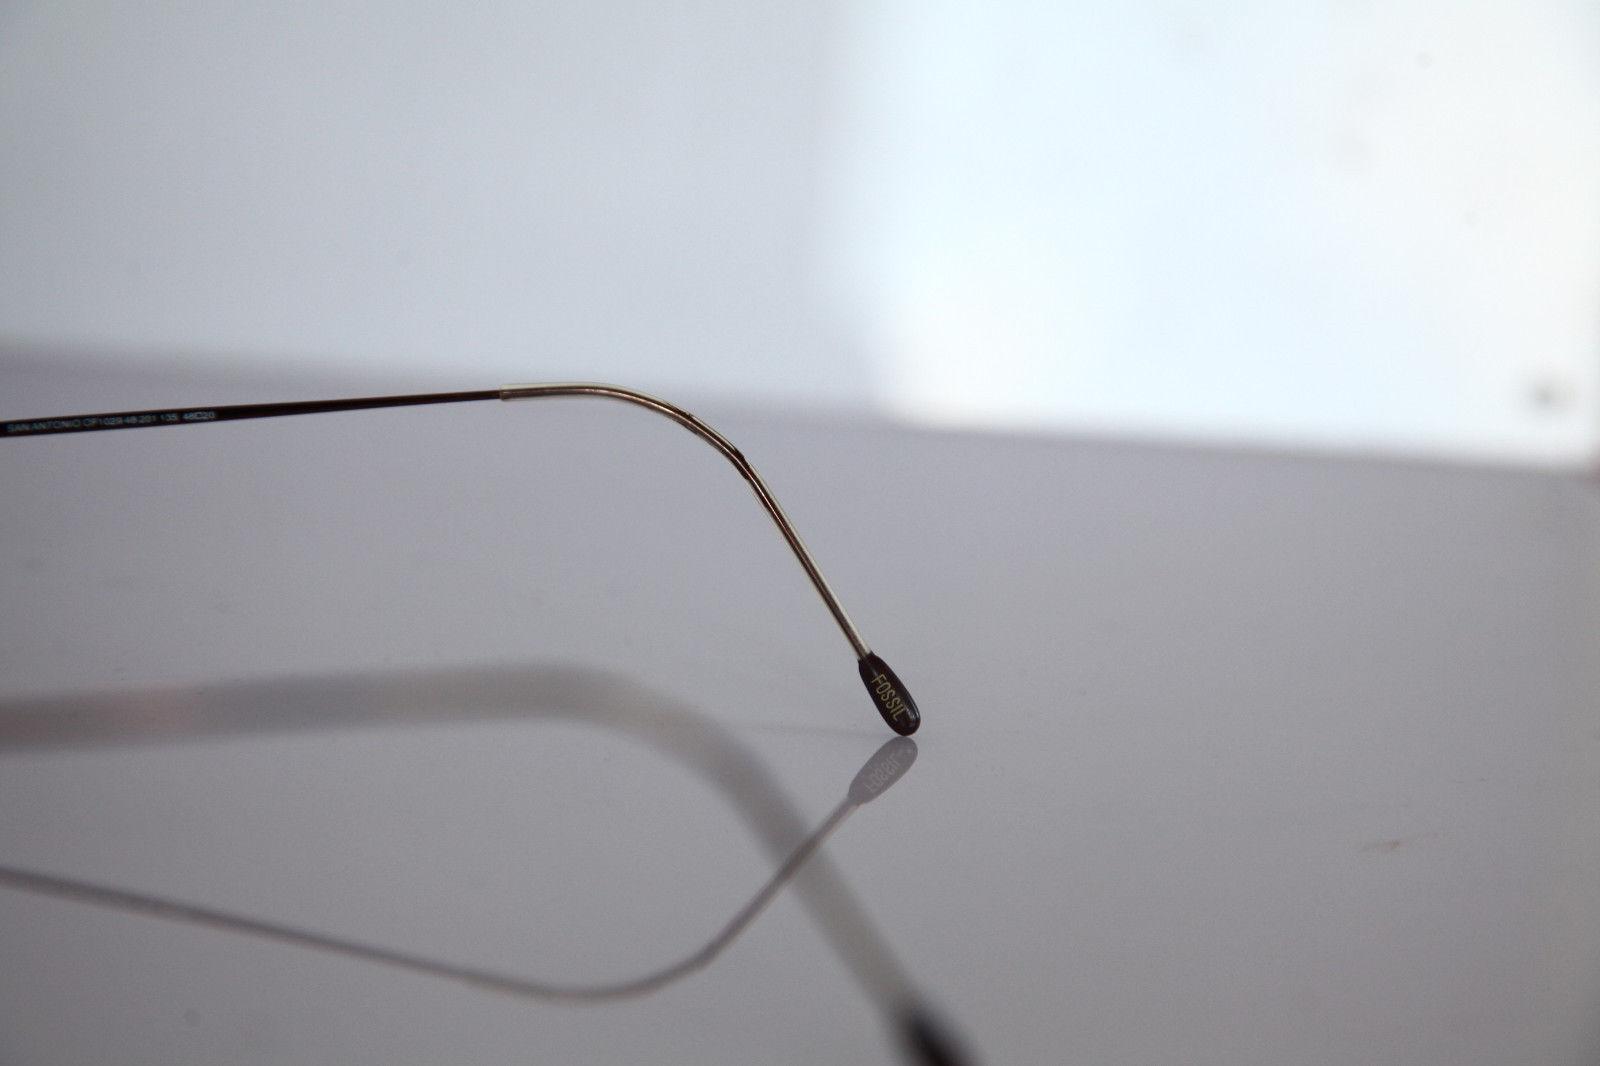 FOSSIL SAN ANTONIO Eyewear, Bronze Frame, RX-Able ...